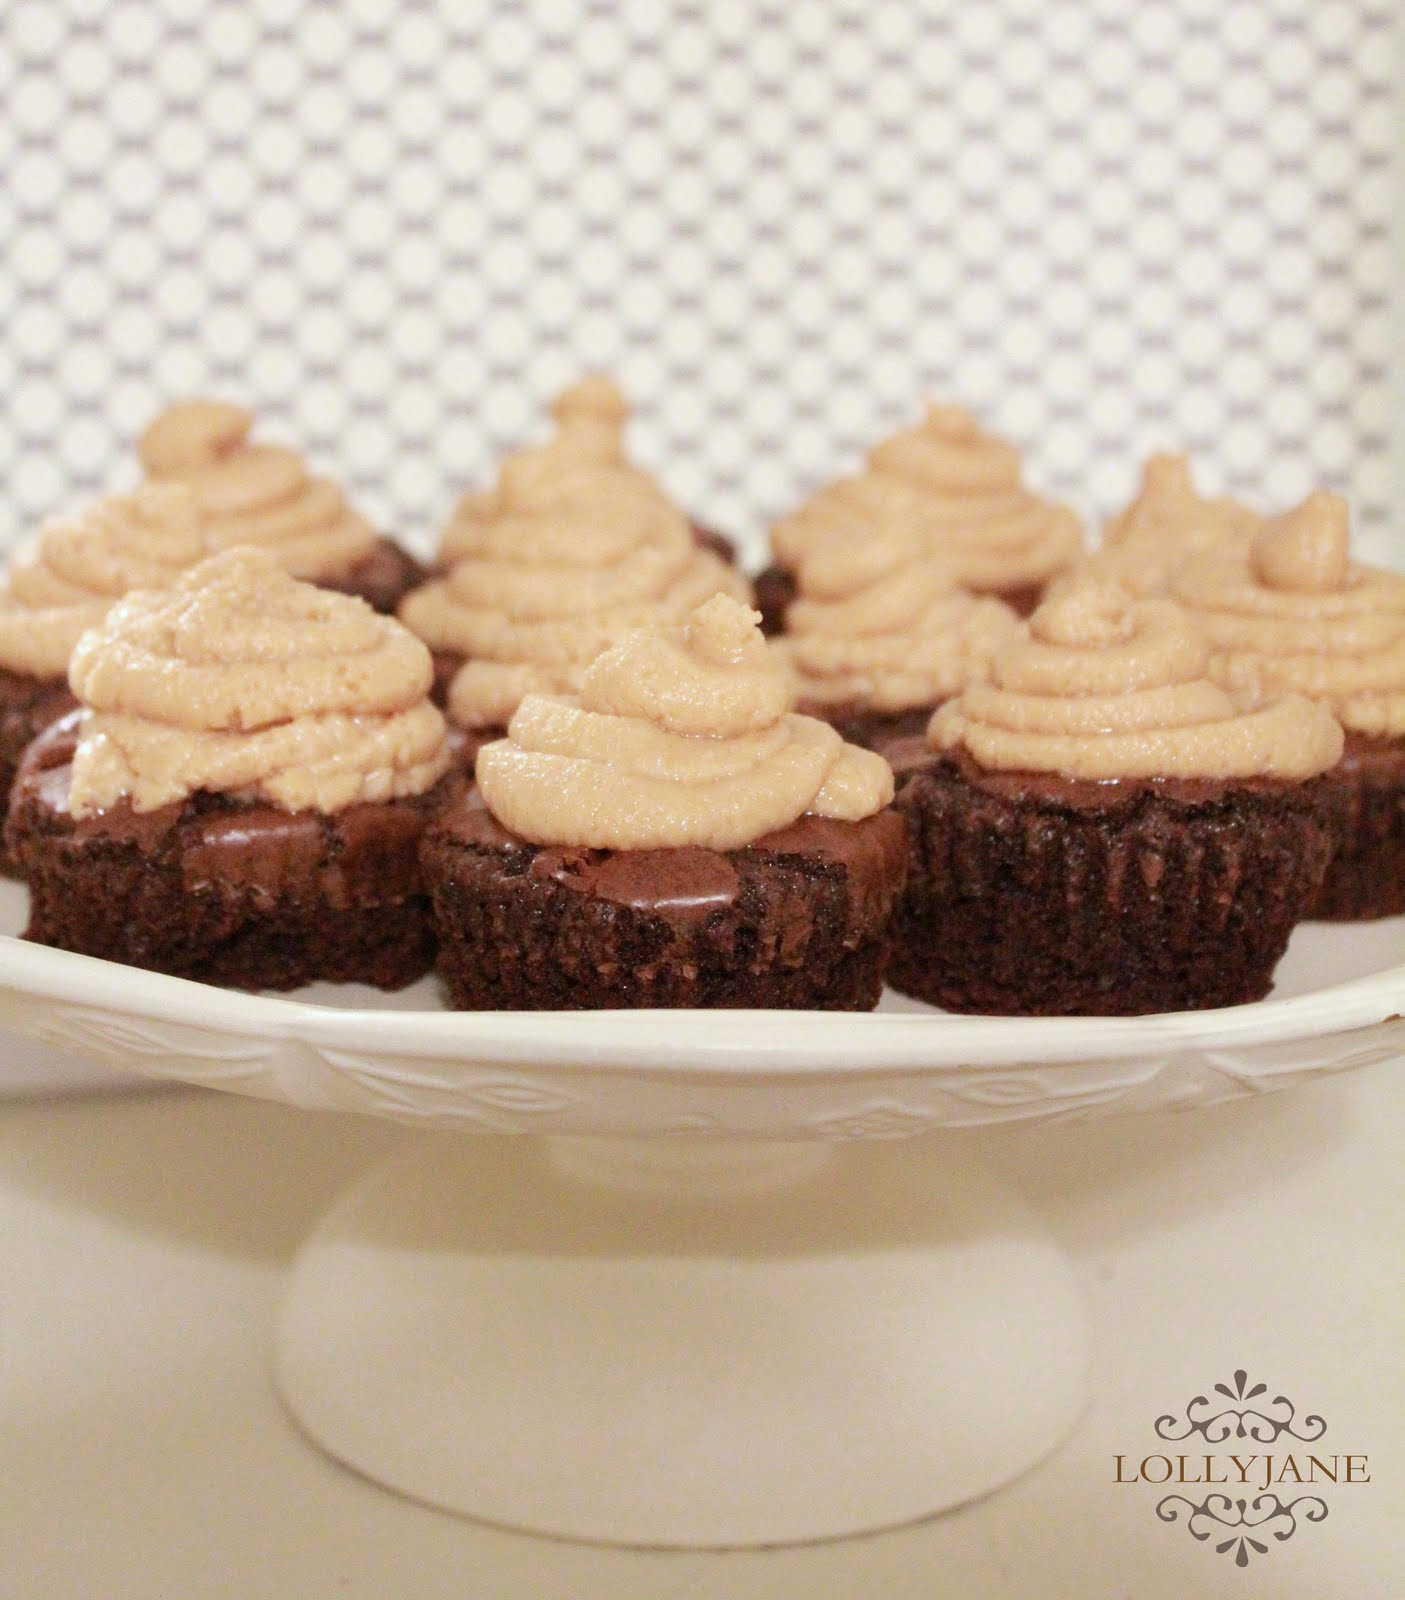 Dark chocolate brownies + peanut butter frosting